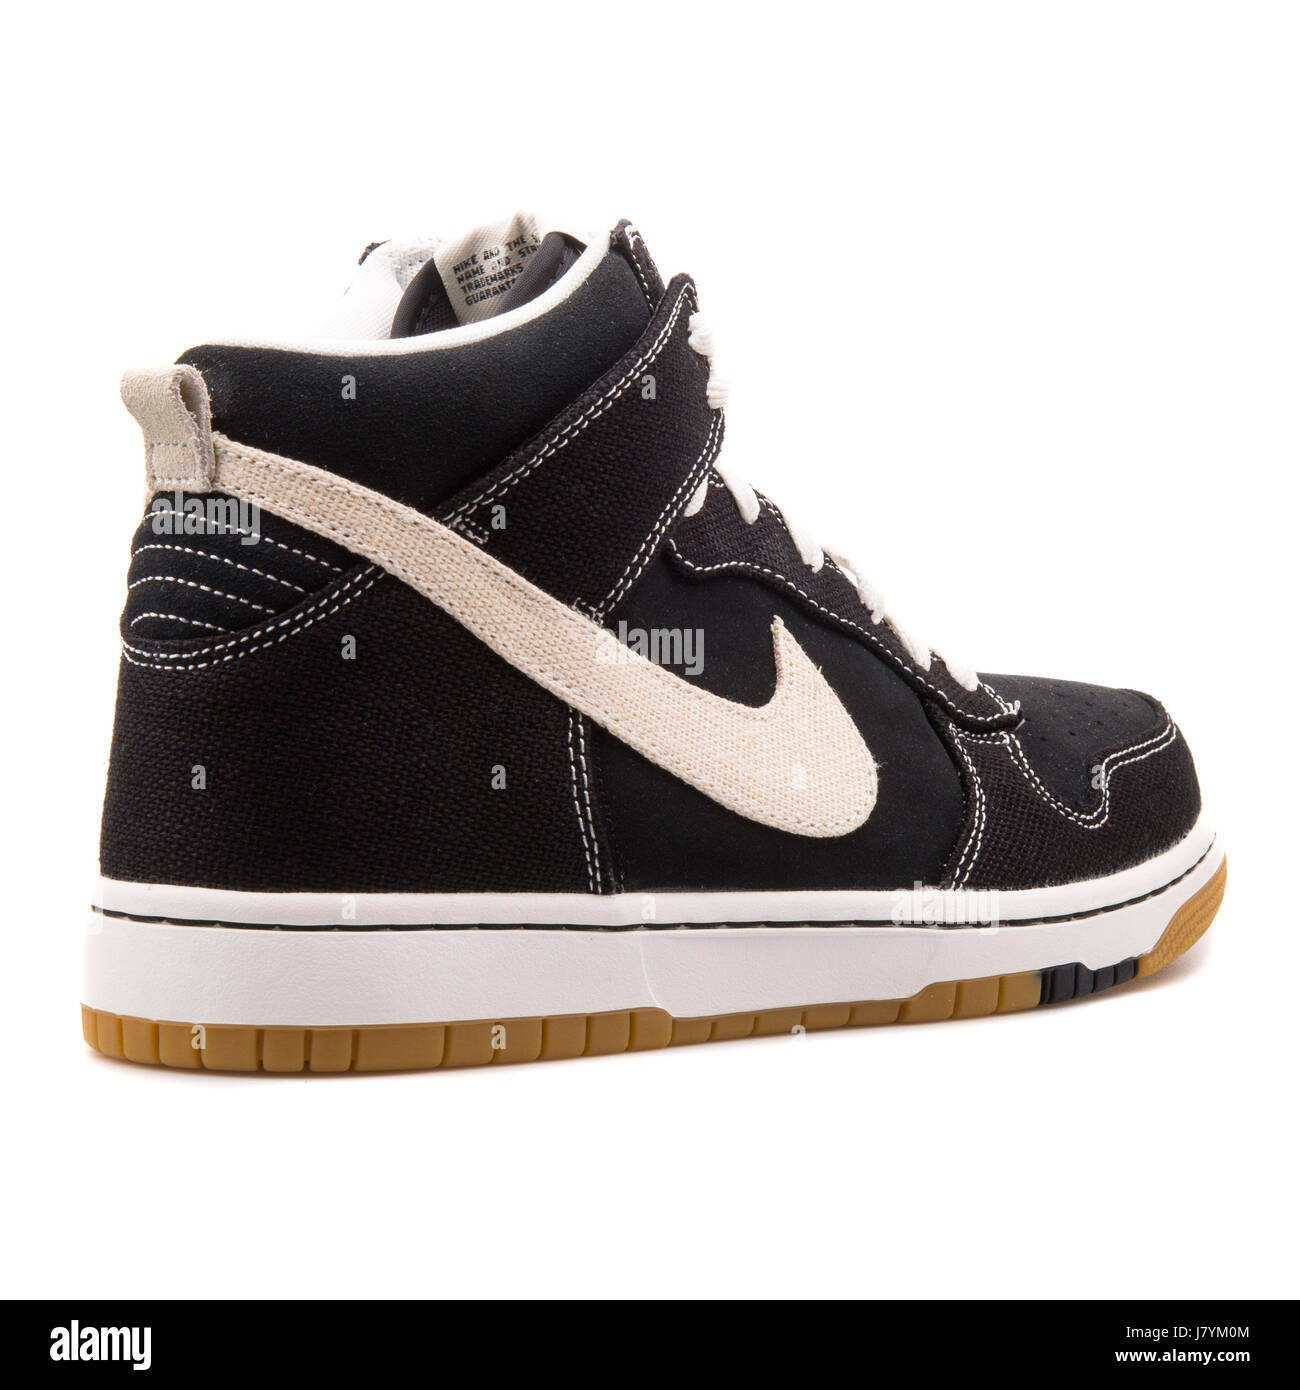 150beed080f Nike Dunk CMFT Black Men s Basketball Sneakers - 705434-002 - Stock Image